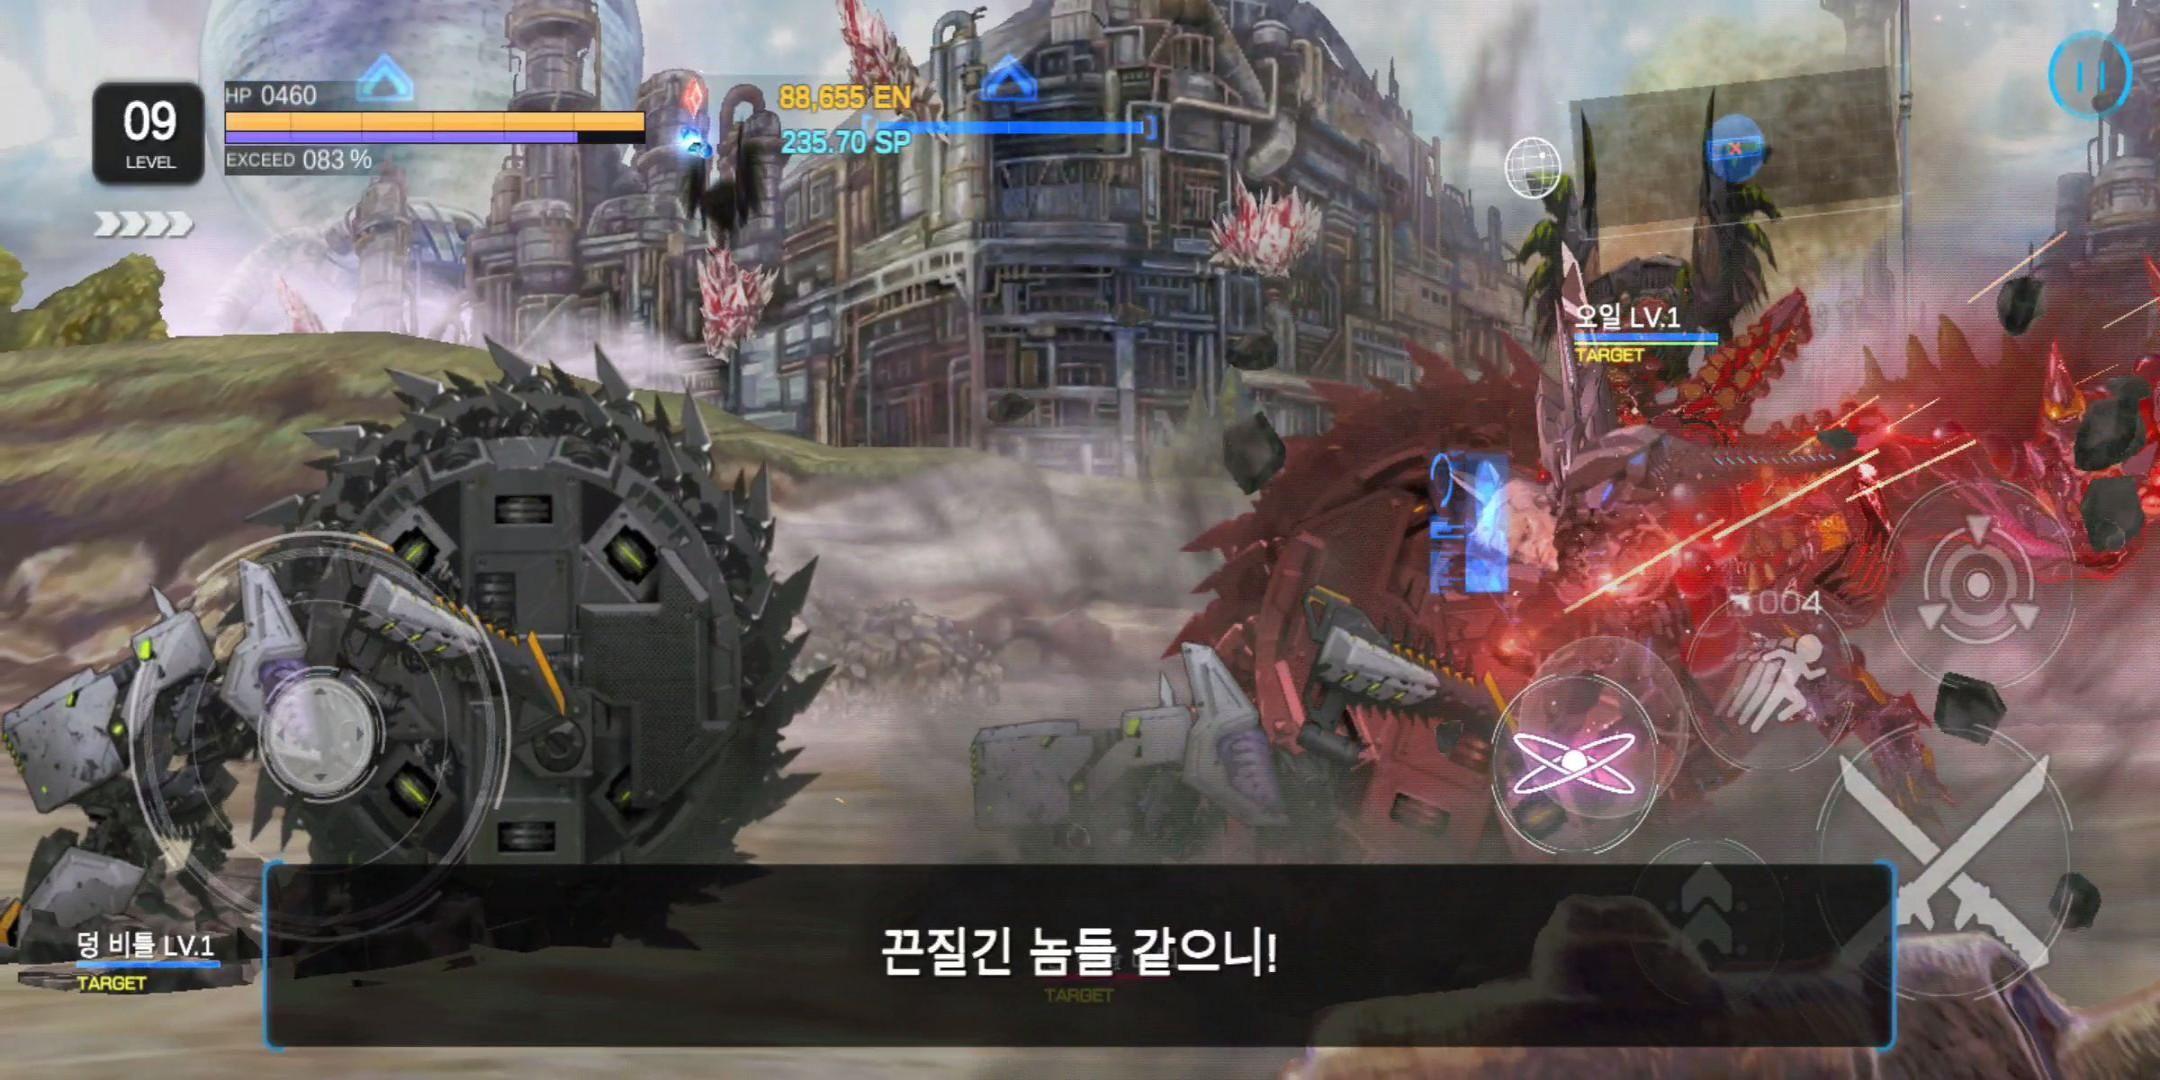 地球战争(Earth WARS) 游戏截图3